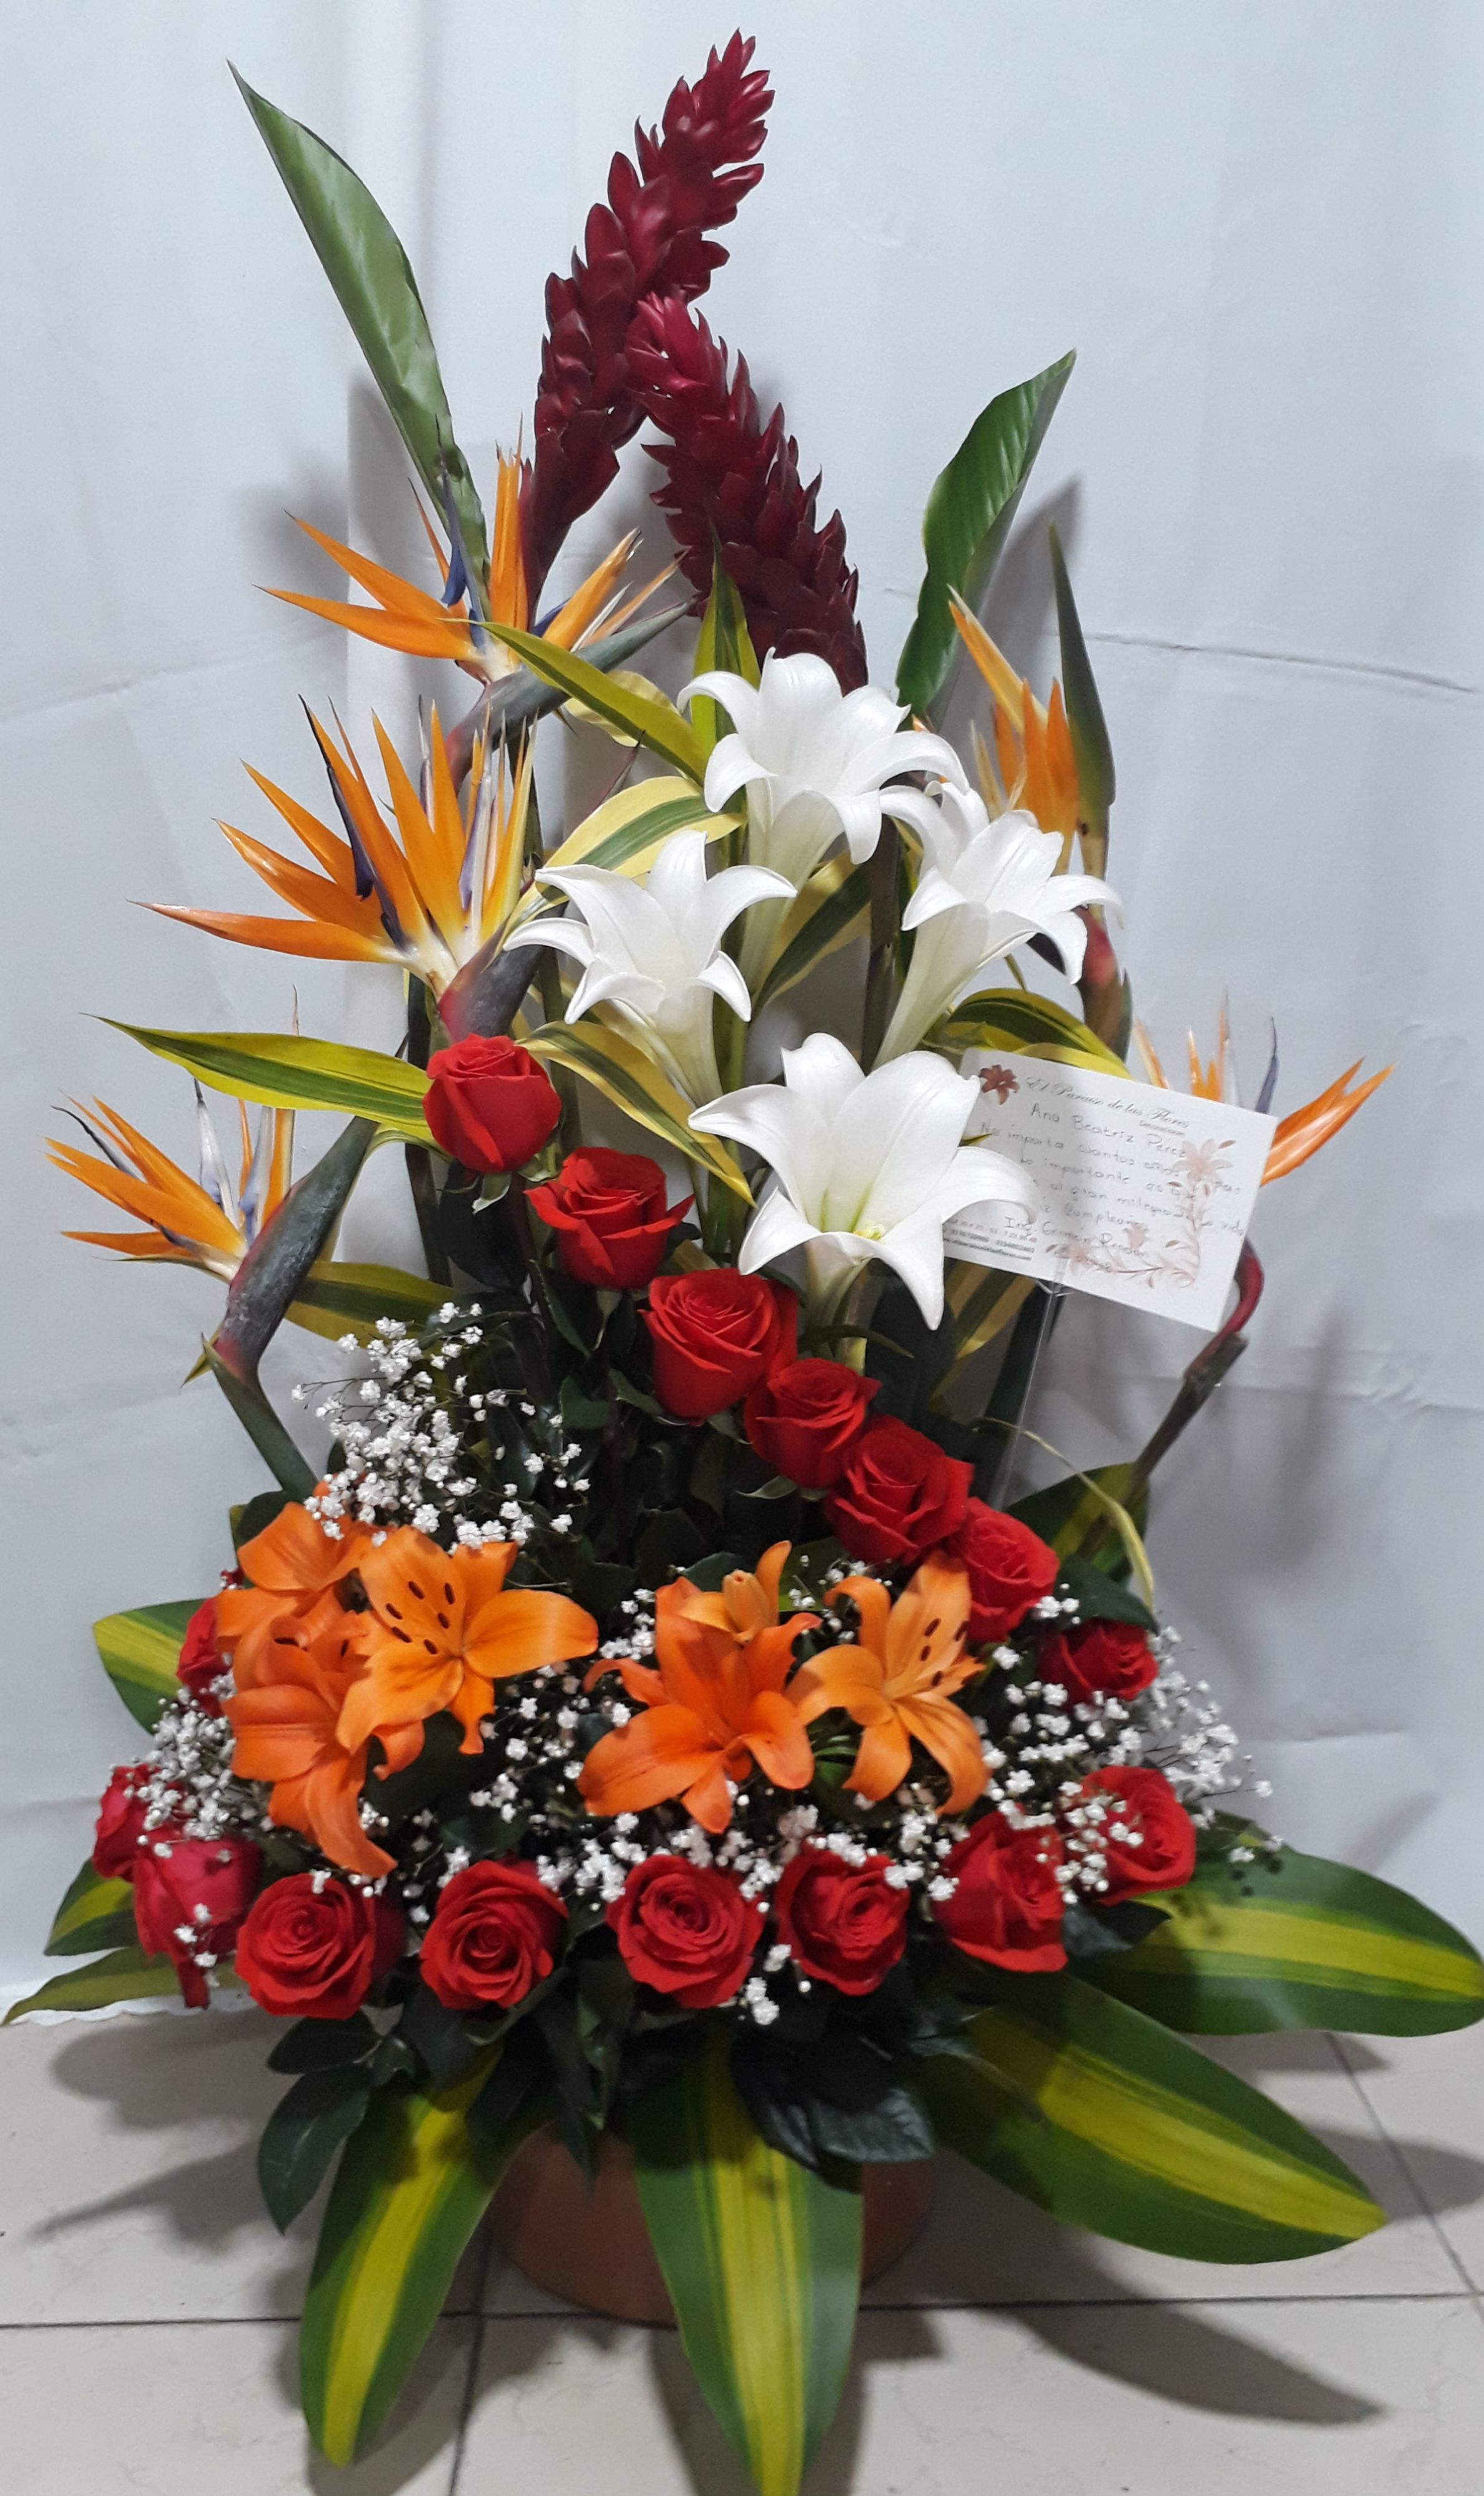 Feliz Cumple Flores Arreglos Florales Arreglo Floral